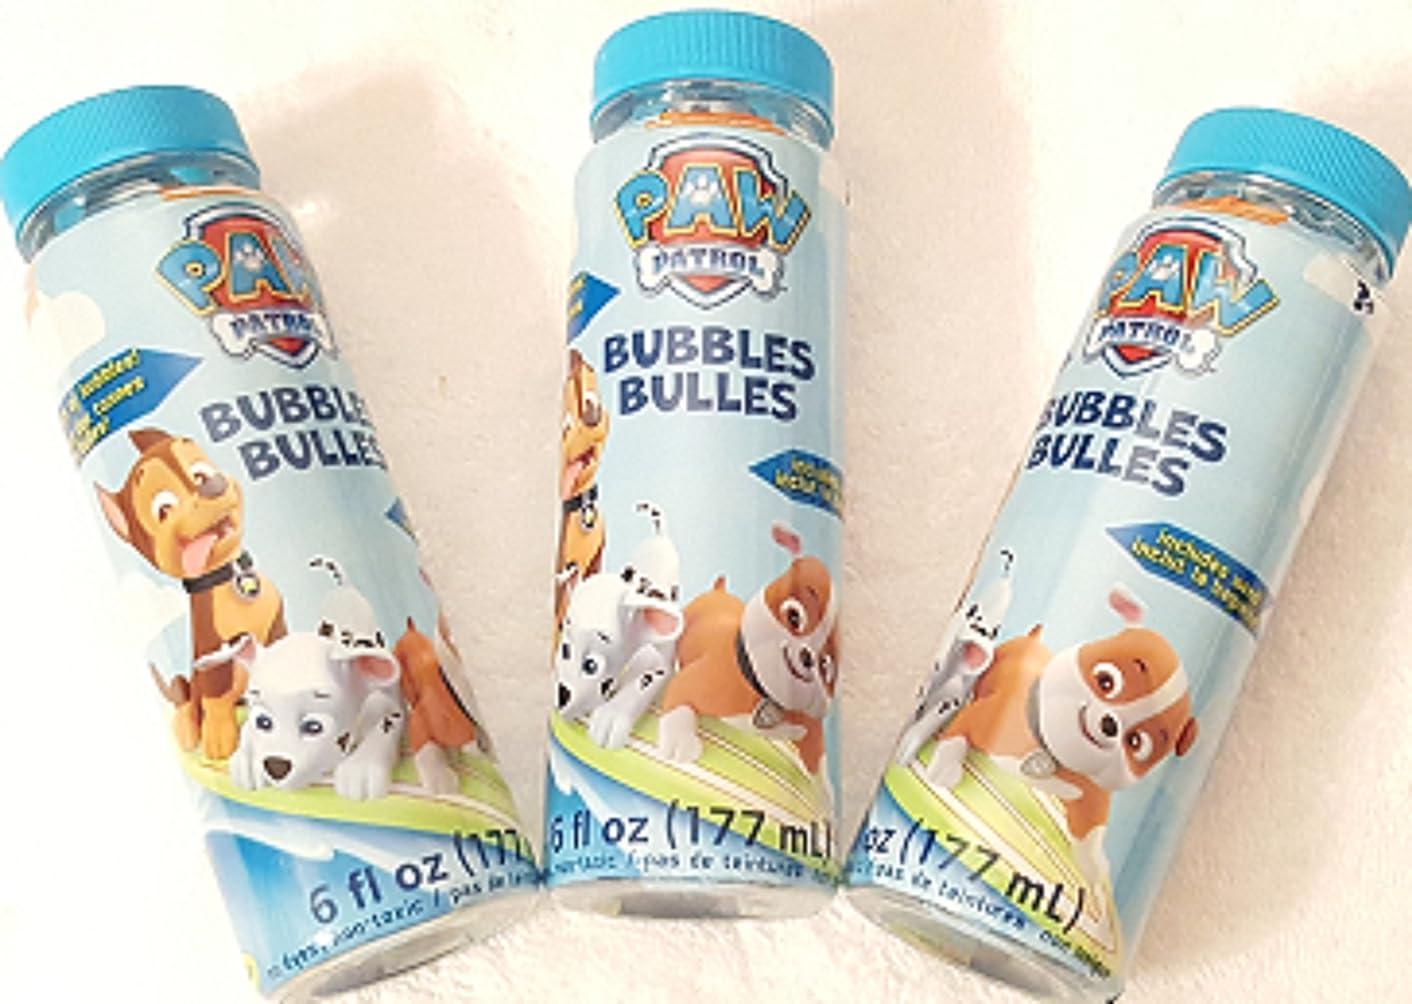 Paw Patrol Blowing Bubbles - 3 Bottles - 6 oz Each Bottle